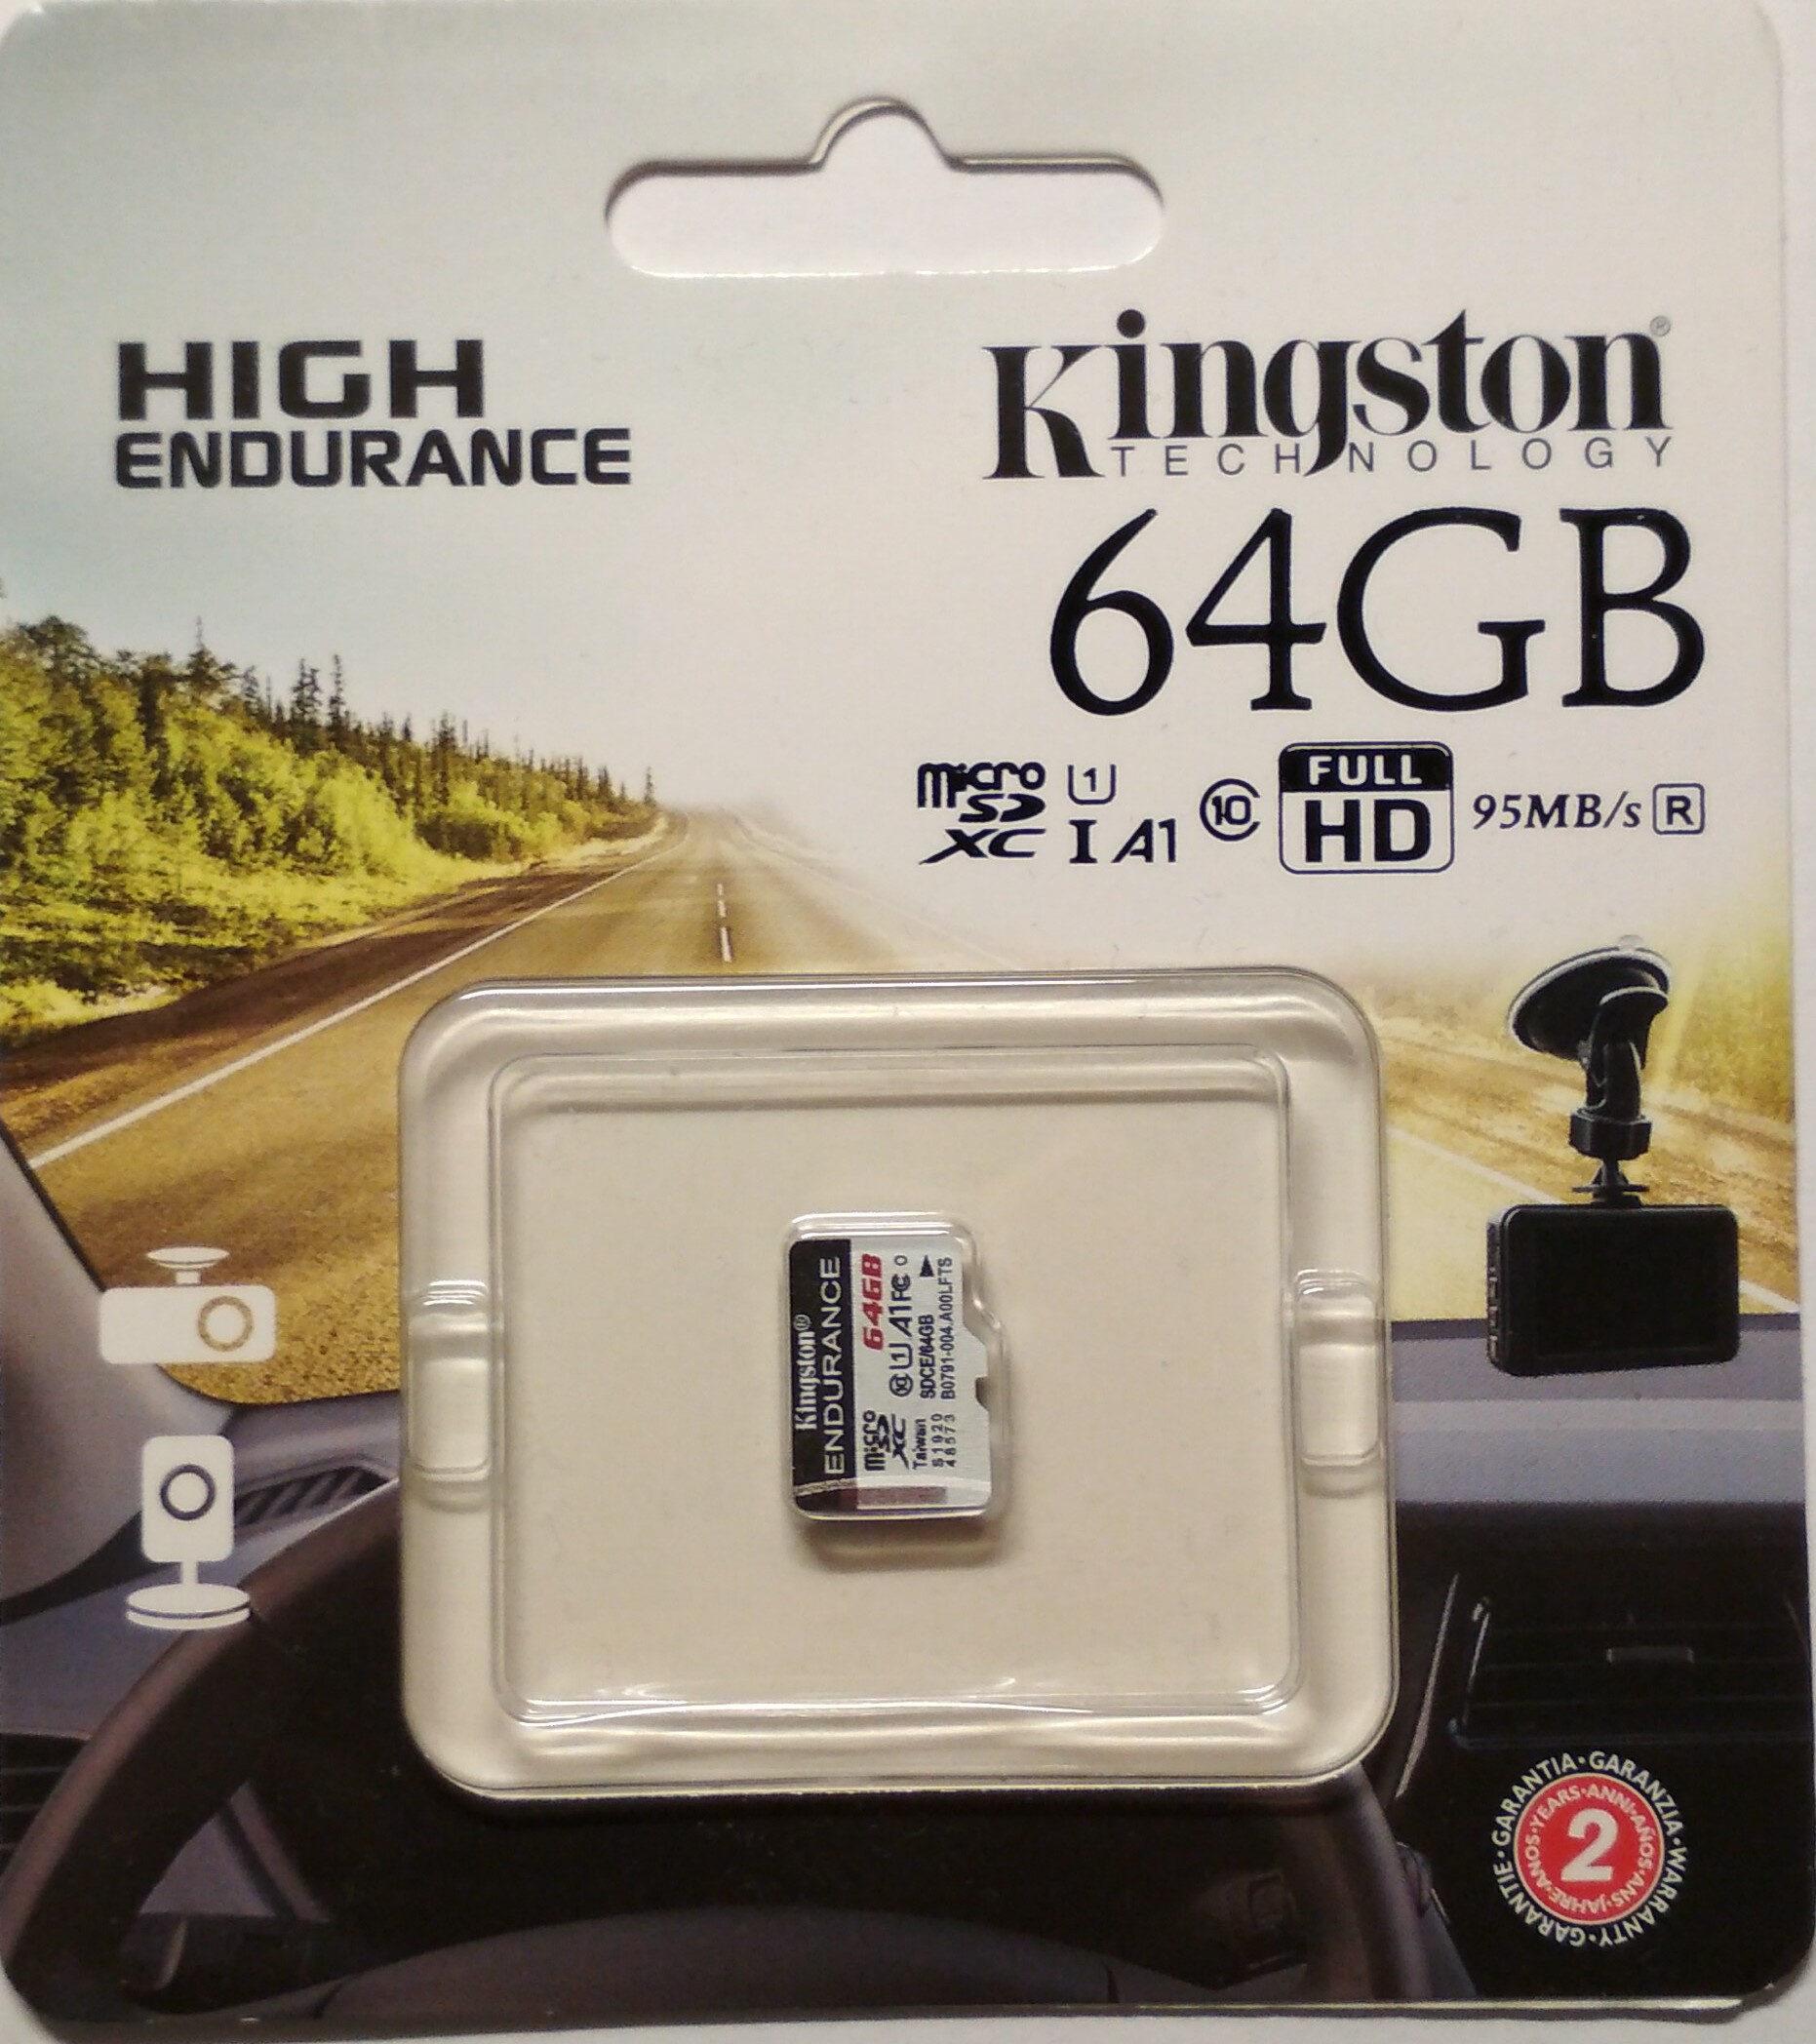 High Endurance 64GB MicroSD - Product